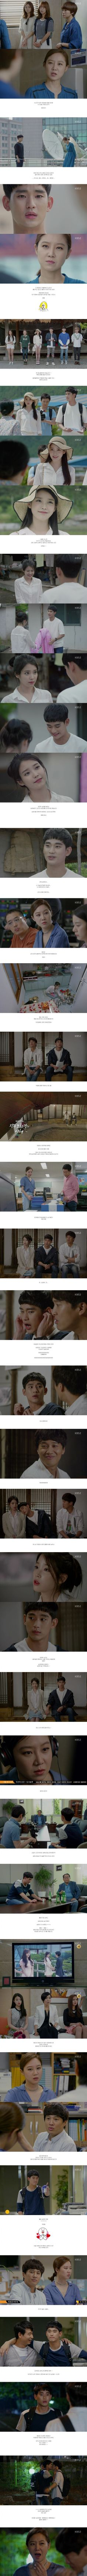 [Spoiler] Added final episodes 11 and 12 captures for the Korean drama 'Producers' @ HanCinema :: The Korean Movie and Drama Database Cha Tae Hyun, Kim Jong Kook, Gong Hyo Jin, Korean Drama, Finals, Kdrama, Ads, Movie, Film